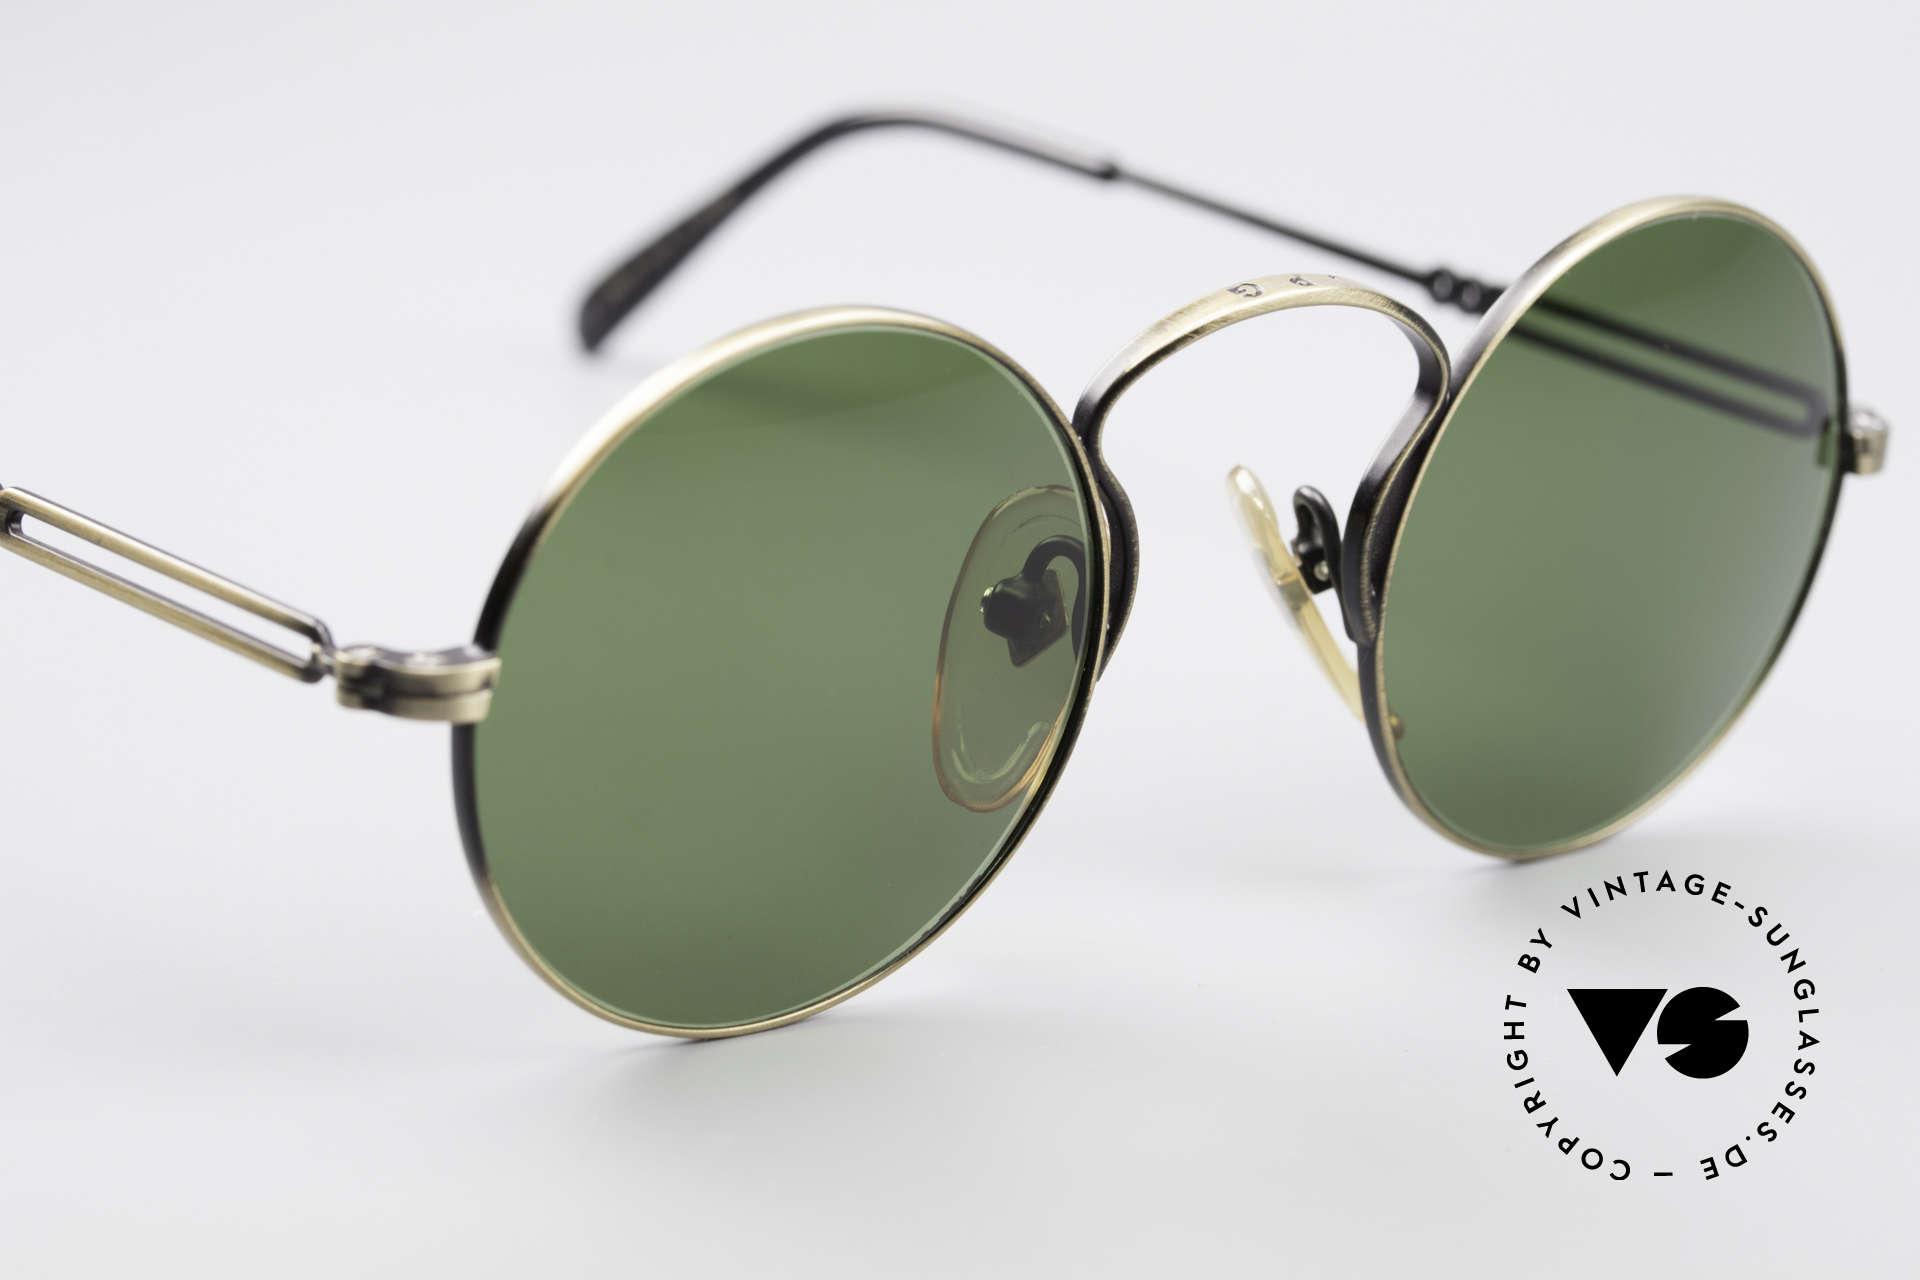 Jean Paul Gaultier 55-0172 90's Designer Sunglasses, NO RETRO shades, but an old J.P. Gaultier original, Made for Men and Women